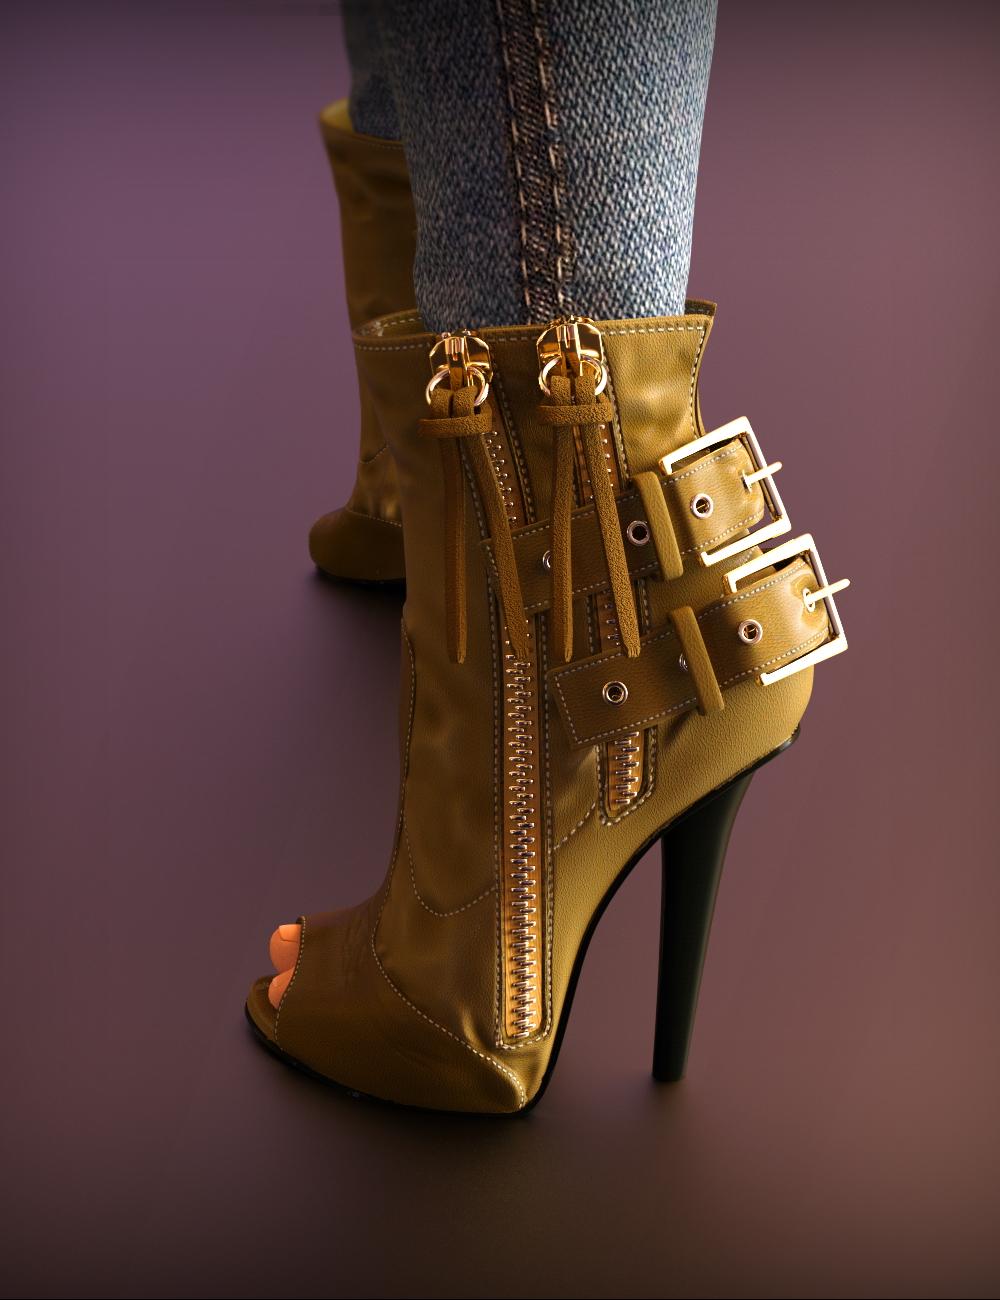 Double Zipper Buckle Boots for Genesis 3 Female(s) by: chungdan, 3D Models by Daz 3D